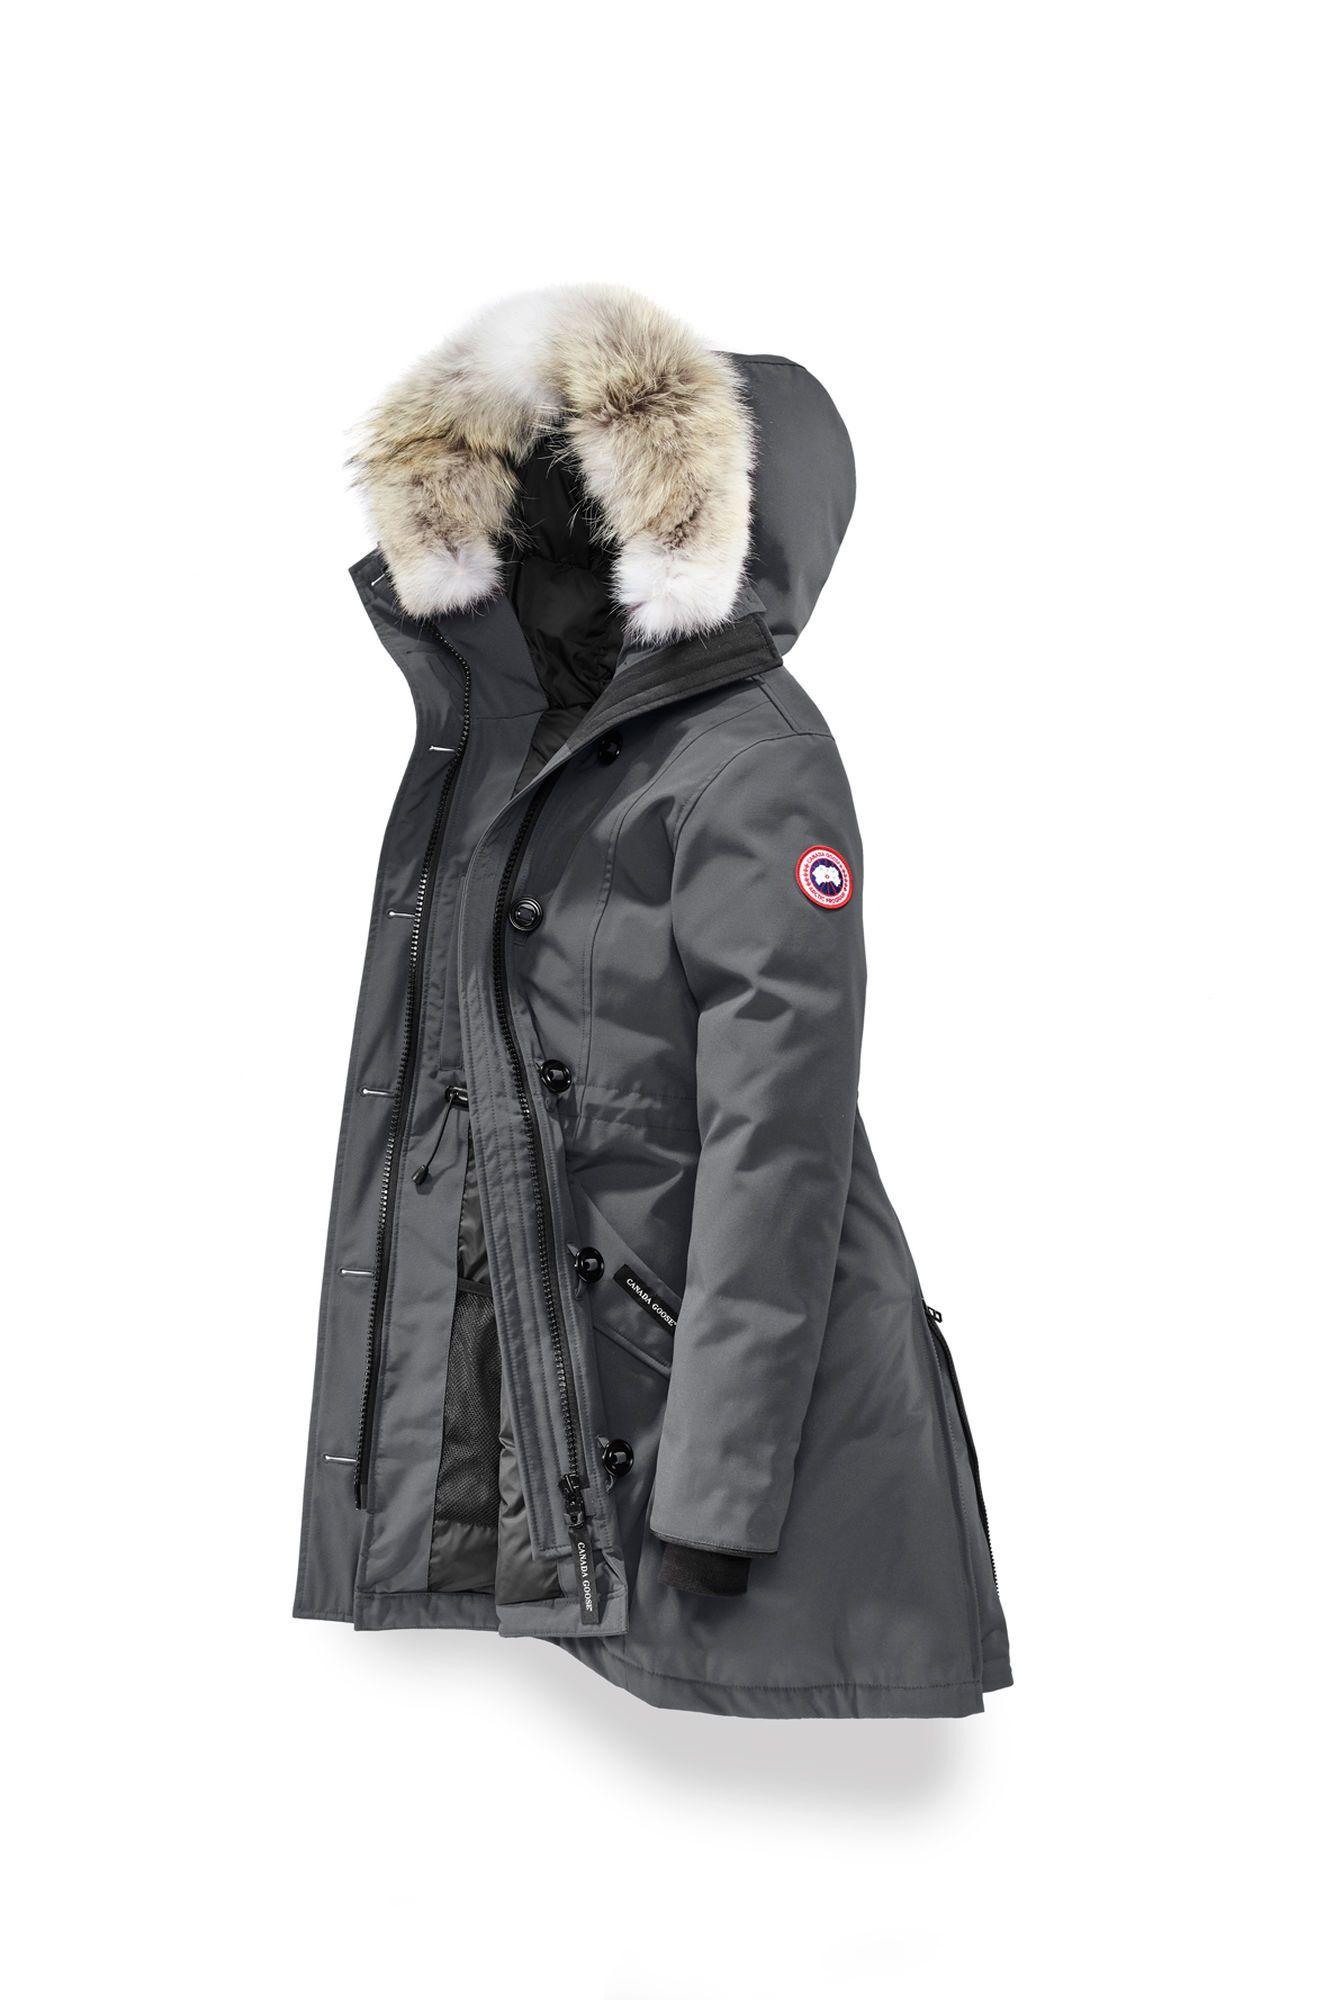 canada goose jacket edinburgh